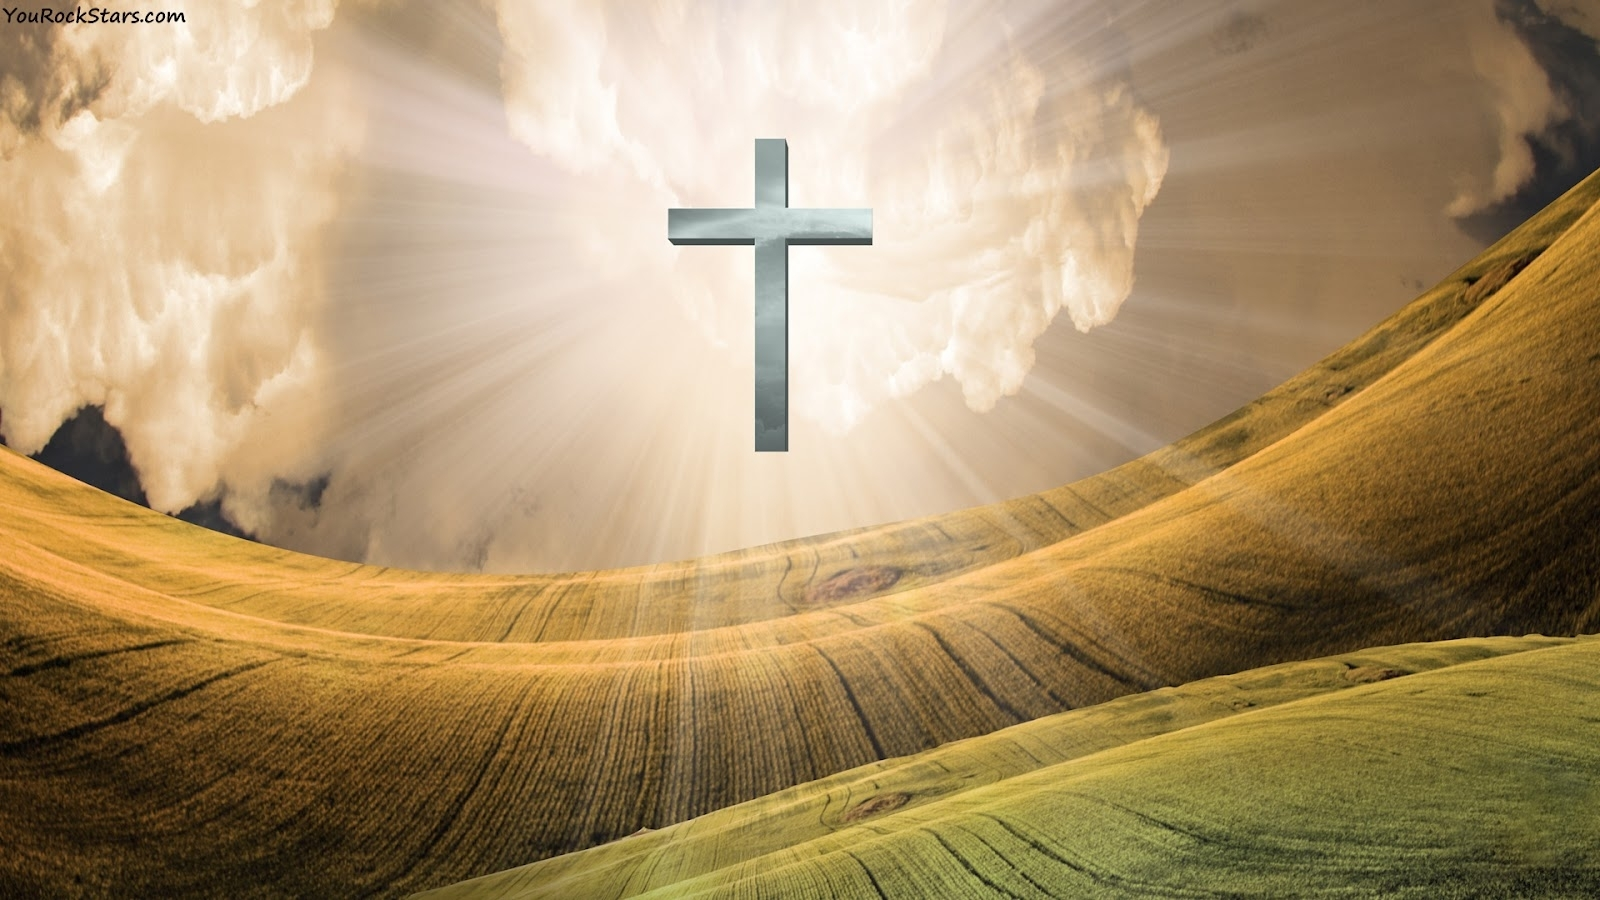 jesus christ background 12 | background check all